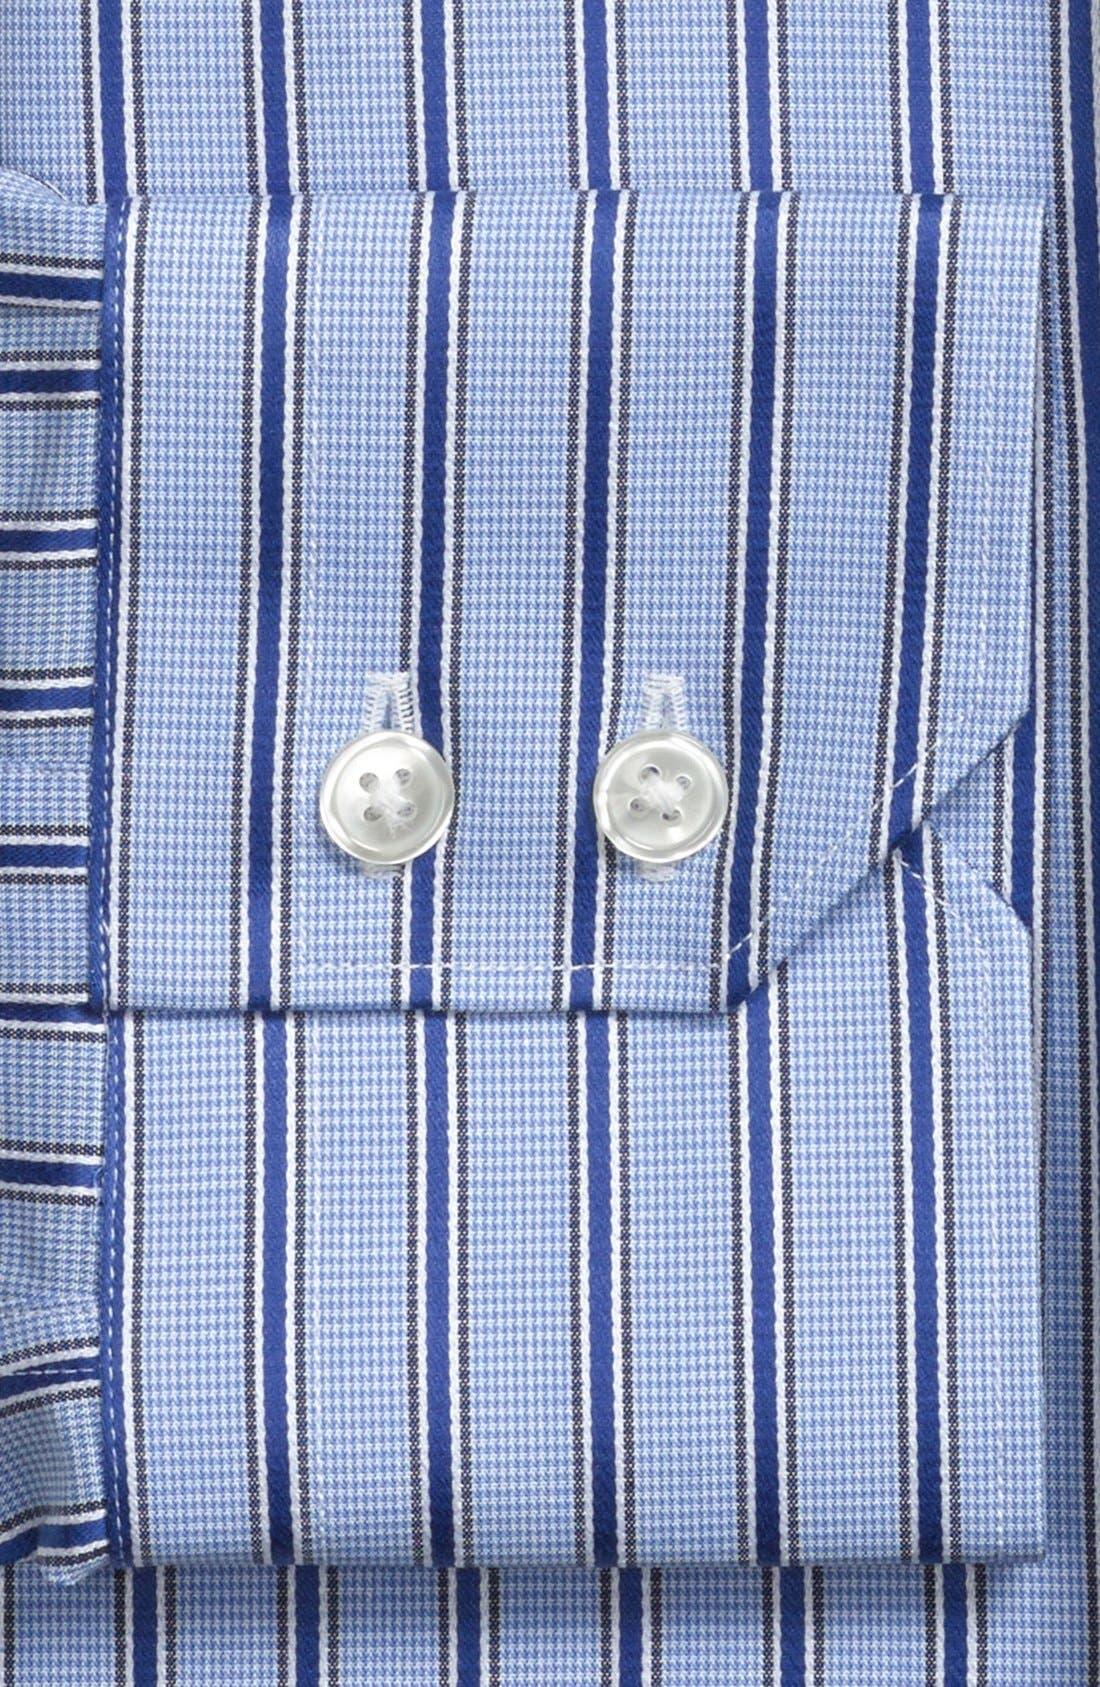 Alternate Image 2  - BOSS HUGO BOSS 'Gulio' US Regular Fit Dress Shirt